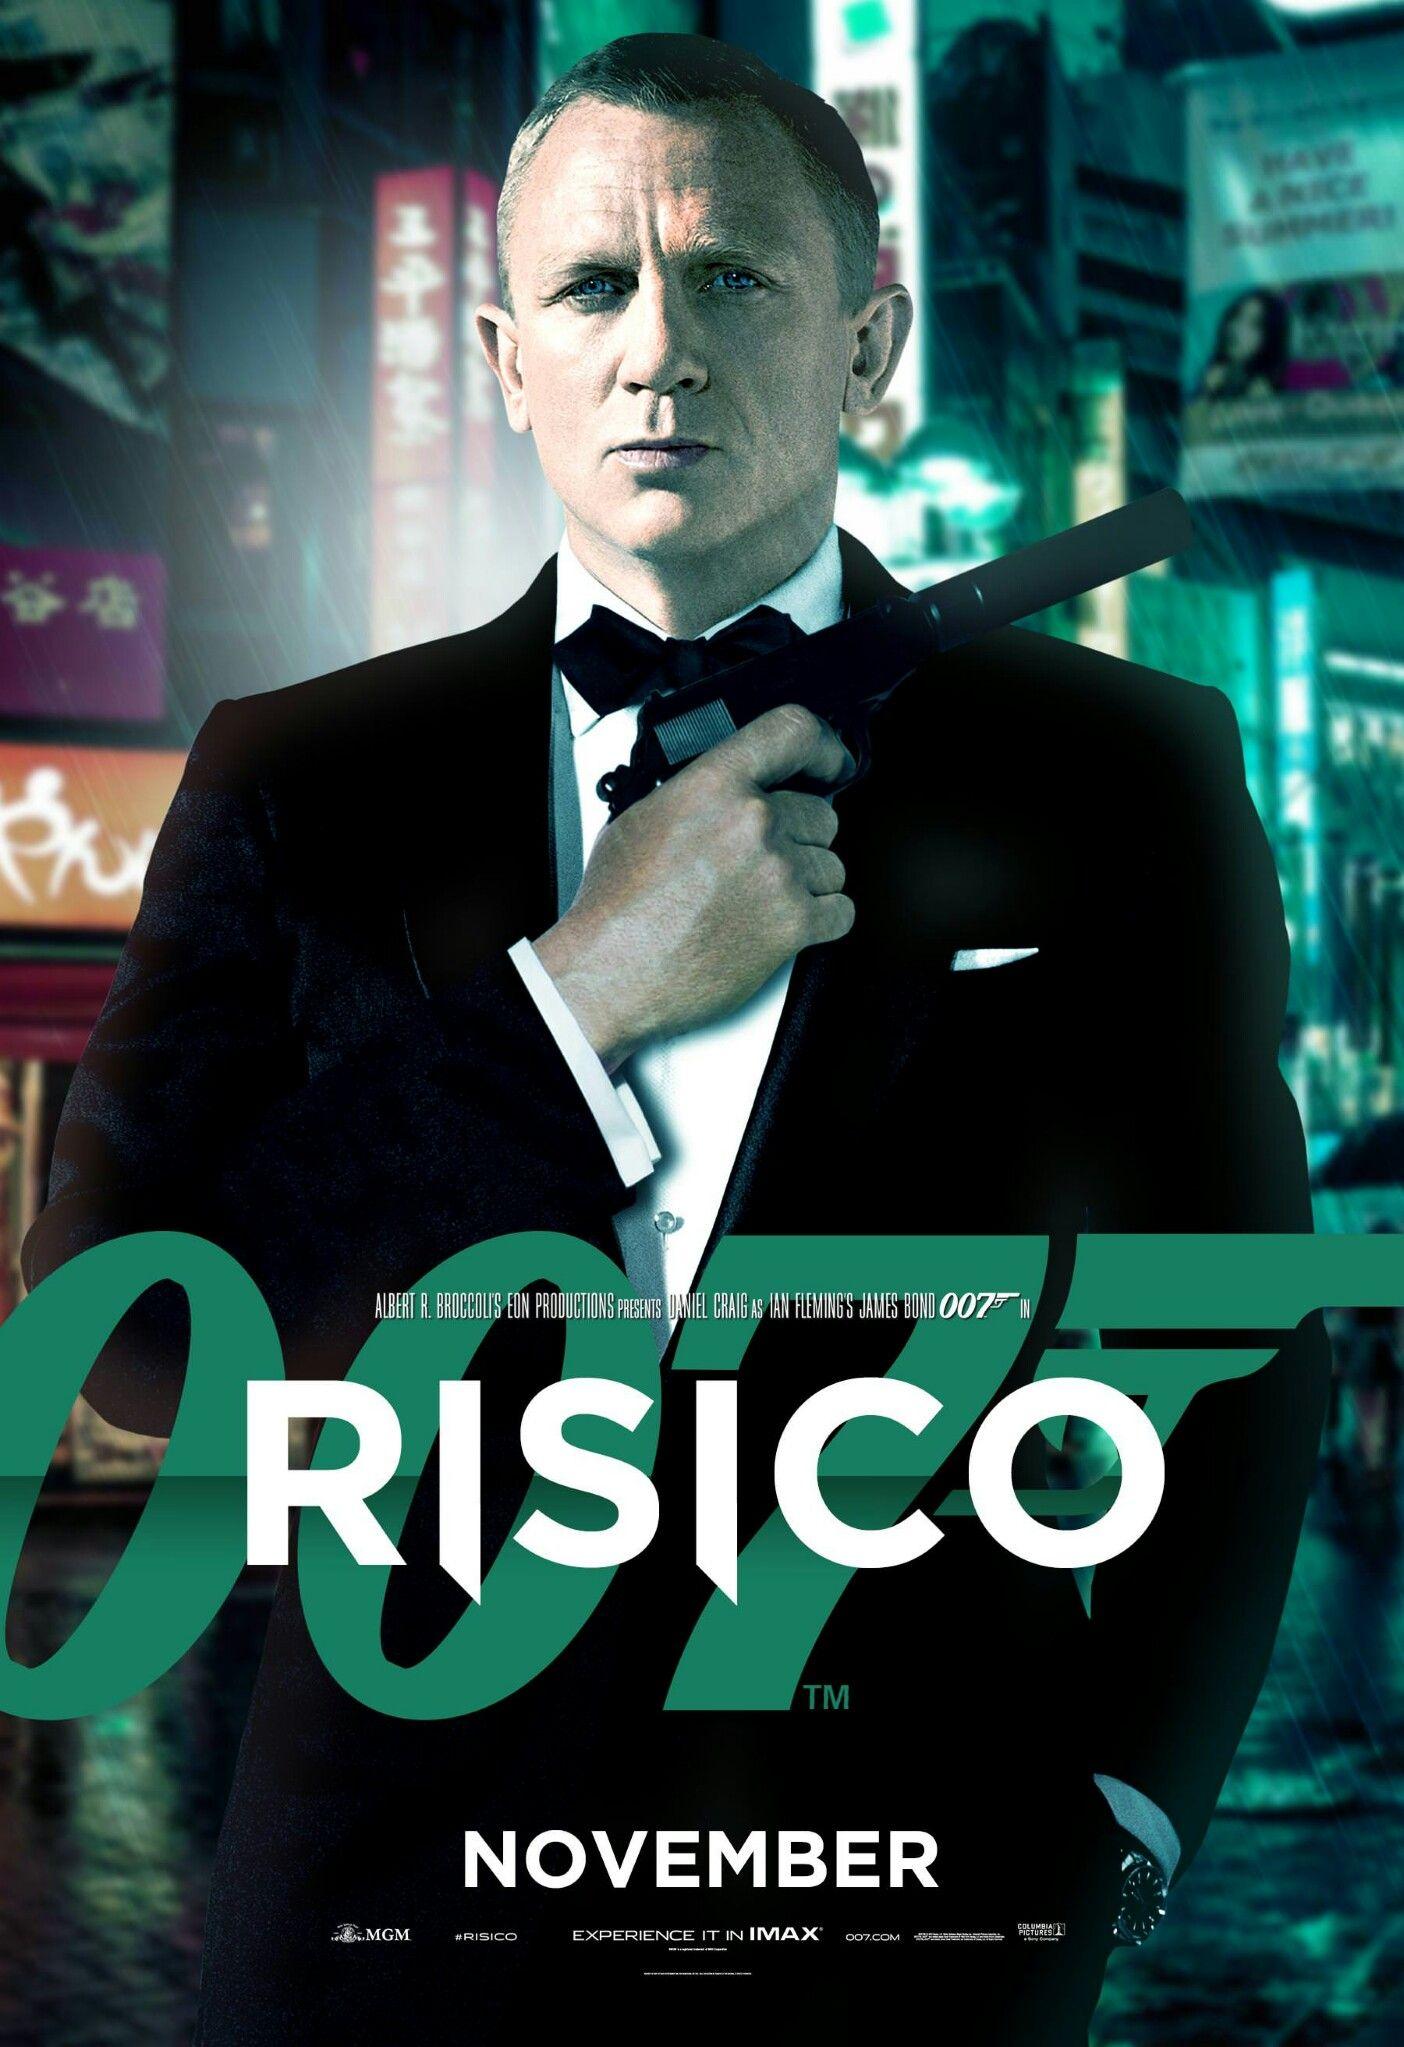 Pin By Todd On James Bond James Bond Movies Daniel Craig